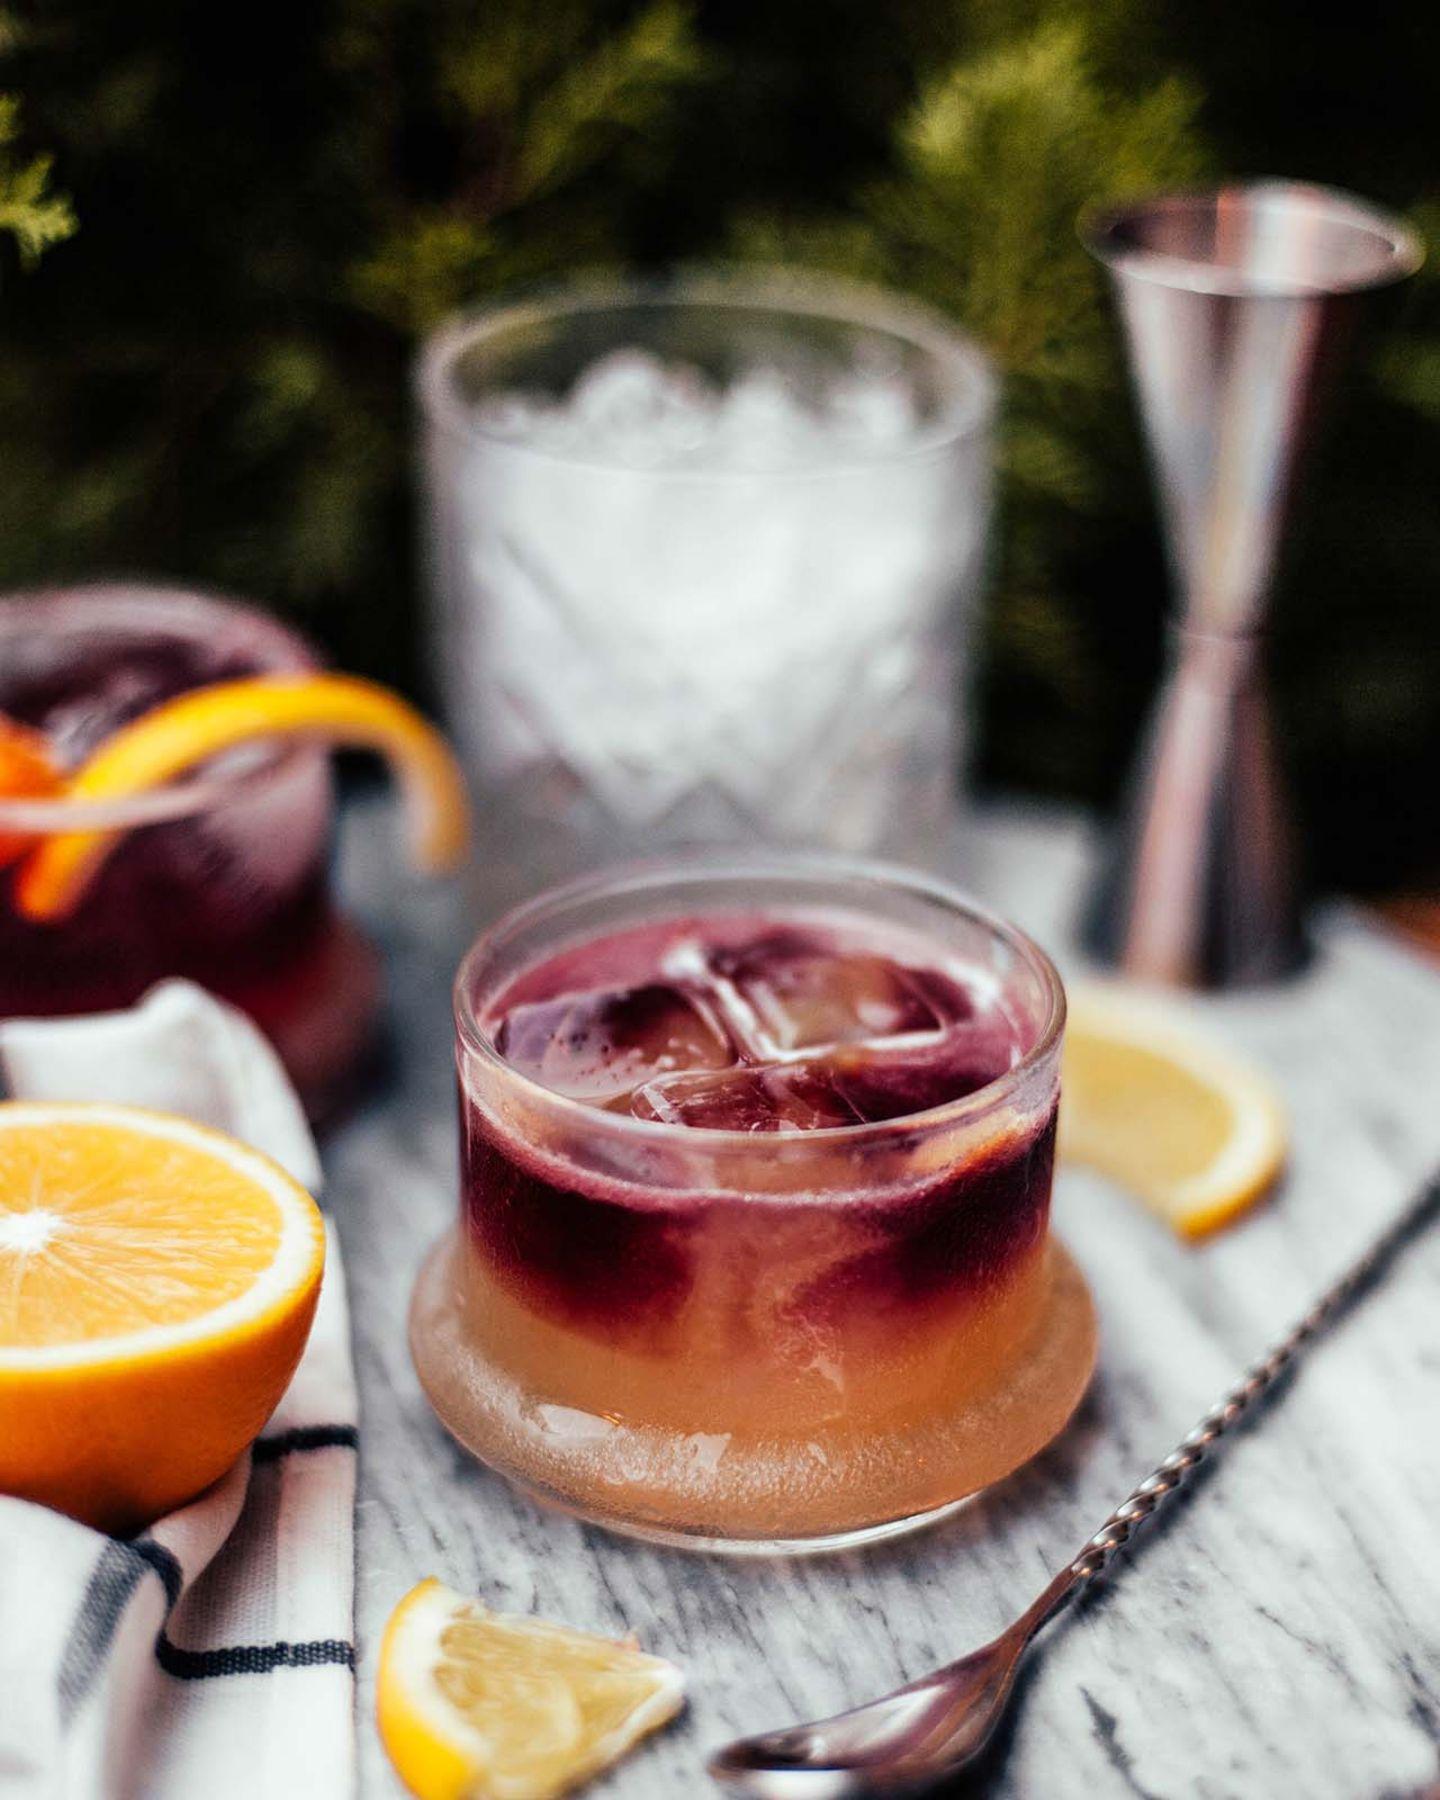 Beliebter Cocktail: New York Sour